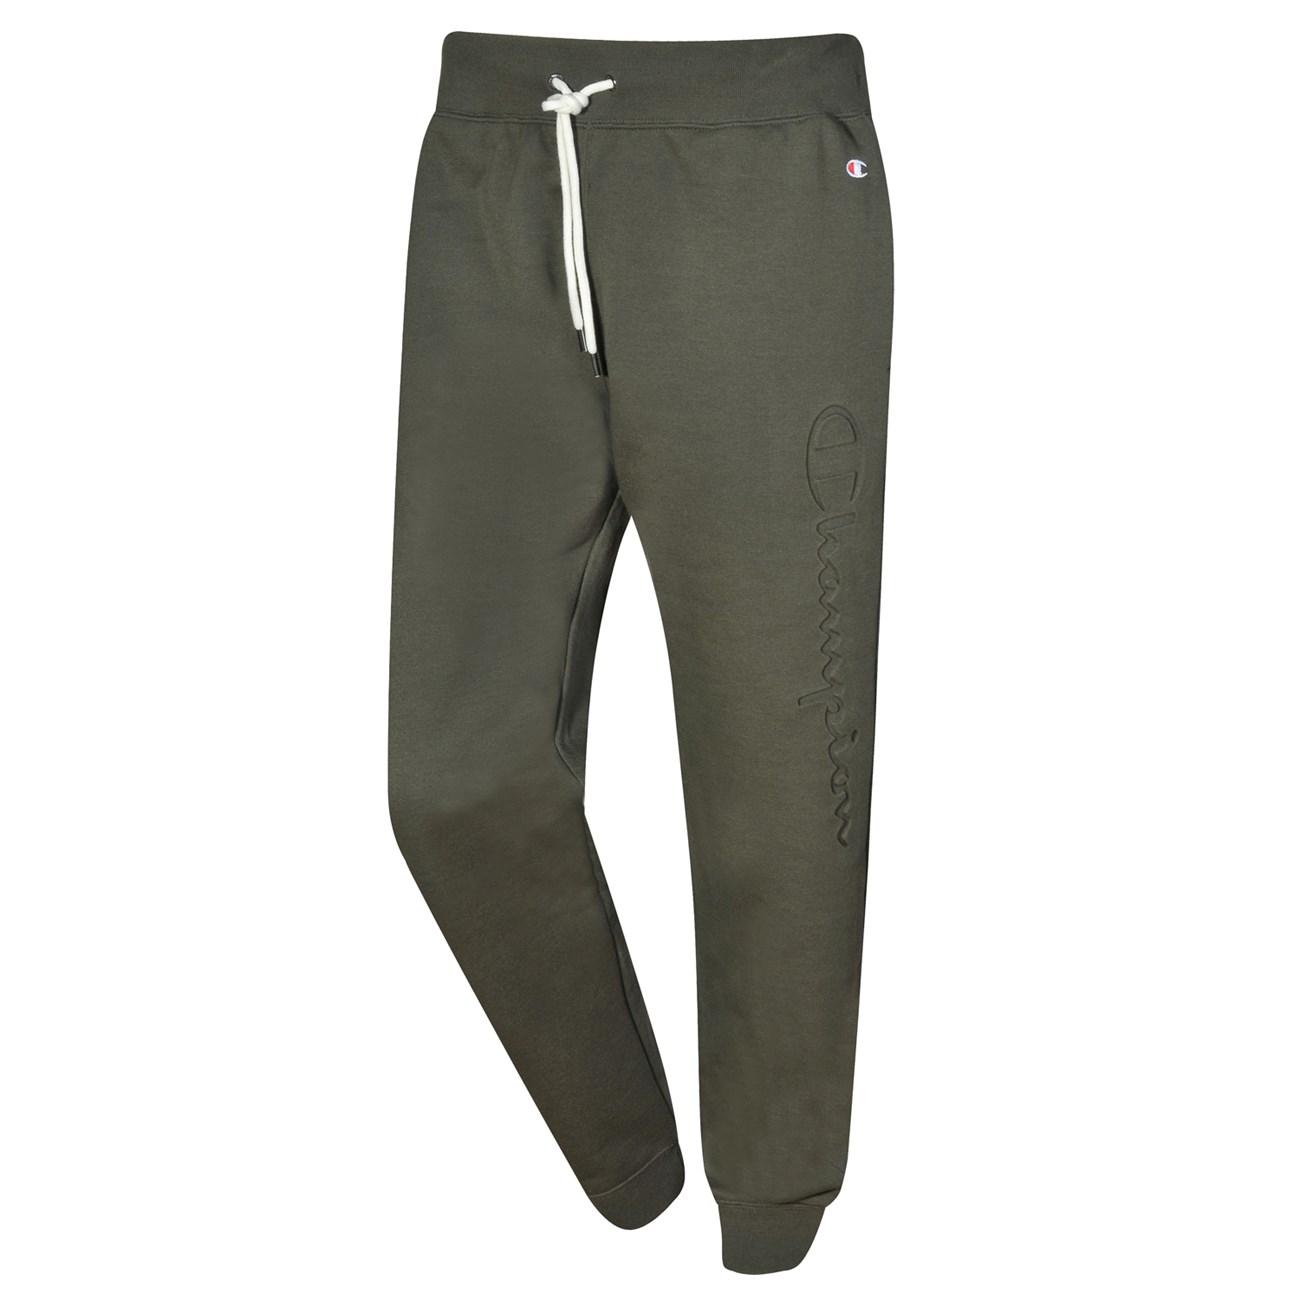 2333c4c8e50a CHAMPION Rib Cuff Pants   Ανδρικά Παντελόνια Φόρμας